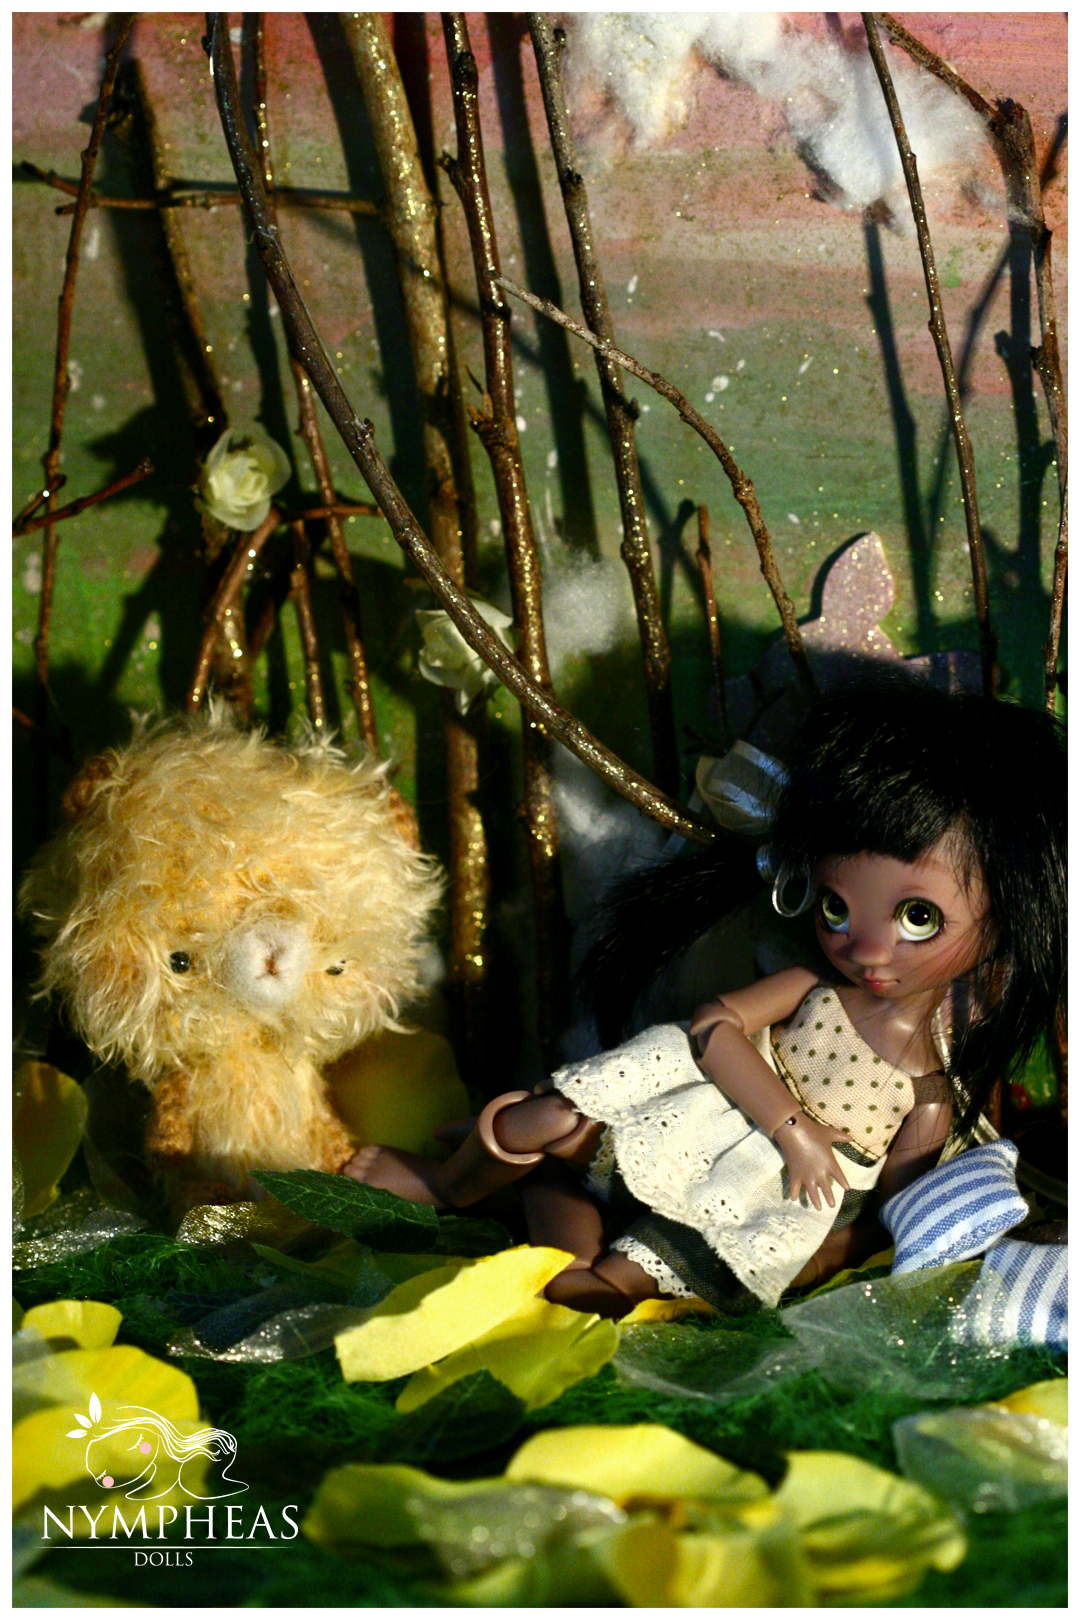 [NYMPHEAS DOLLS] Tit'herbe & Tit'Fleur Snow P35 - Page 3 IMG_8873